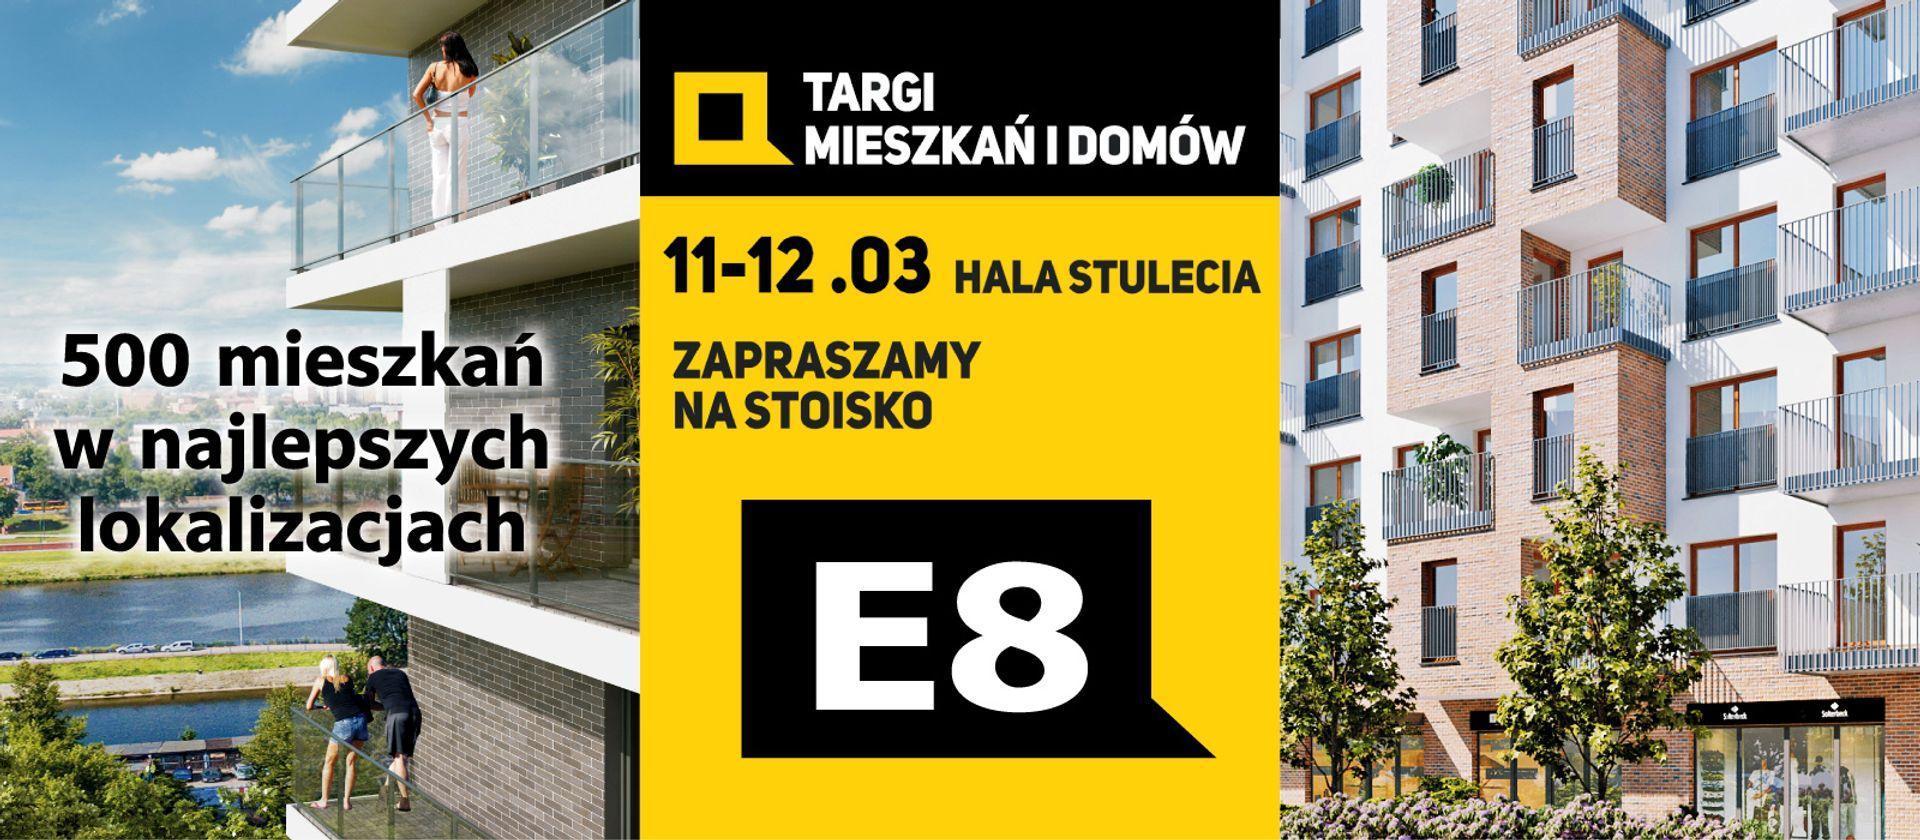 [Wrocław] Targi mieszkaniowe na hali Stulecia już w ten weekend